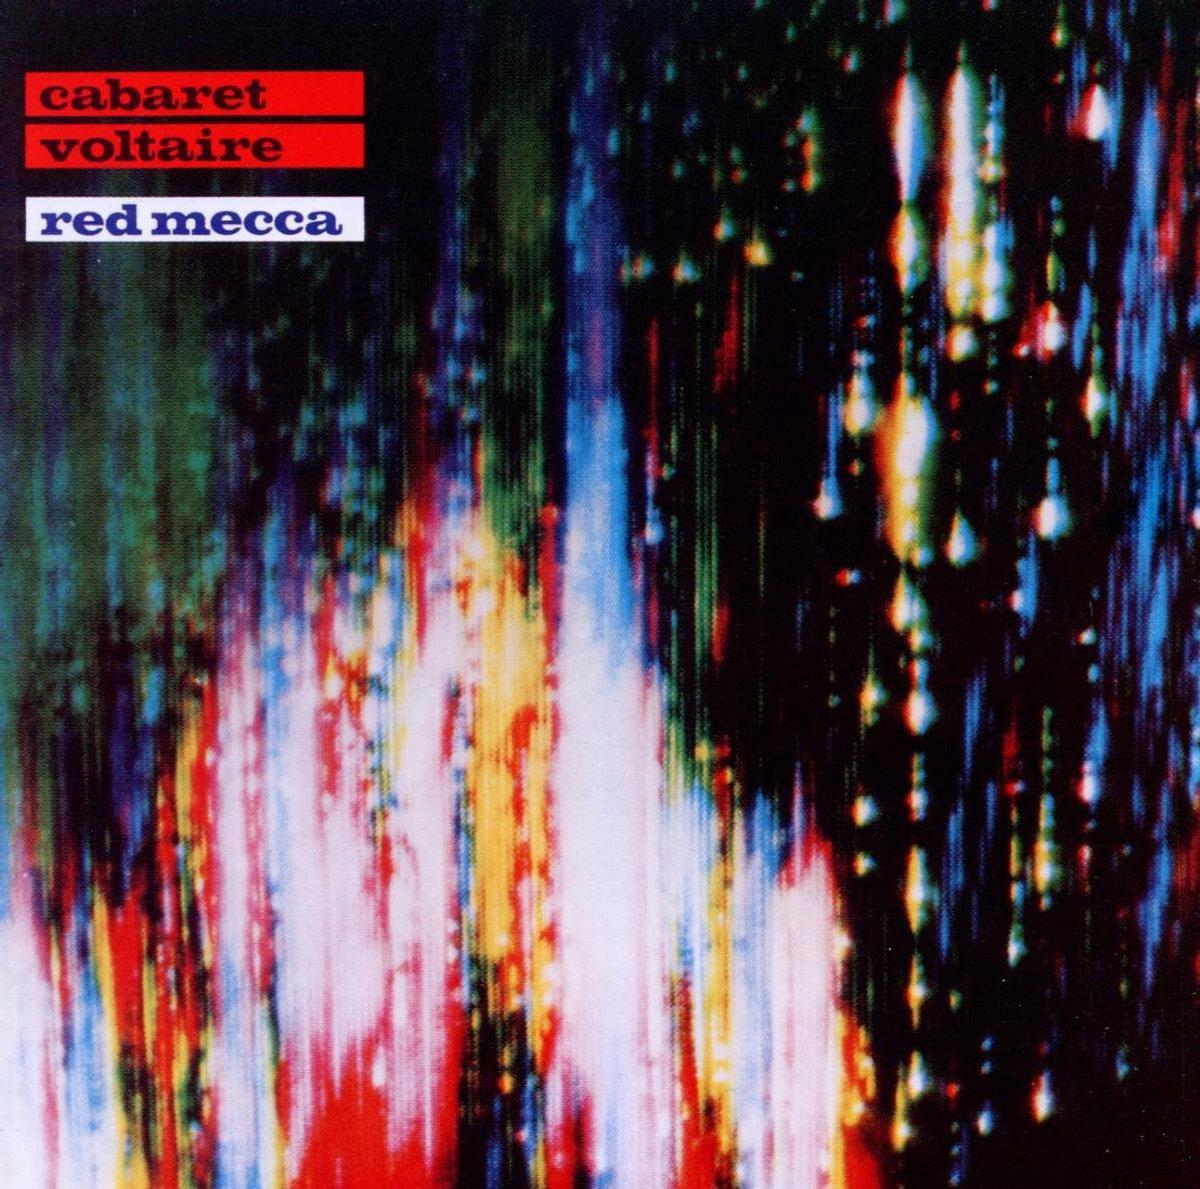 Red Mecca, Cabaret Voltaire   CD (album)   Muziek   bol.com